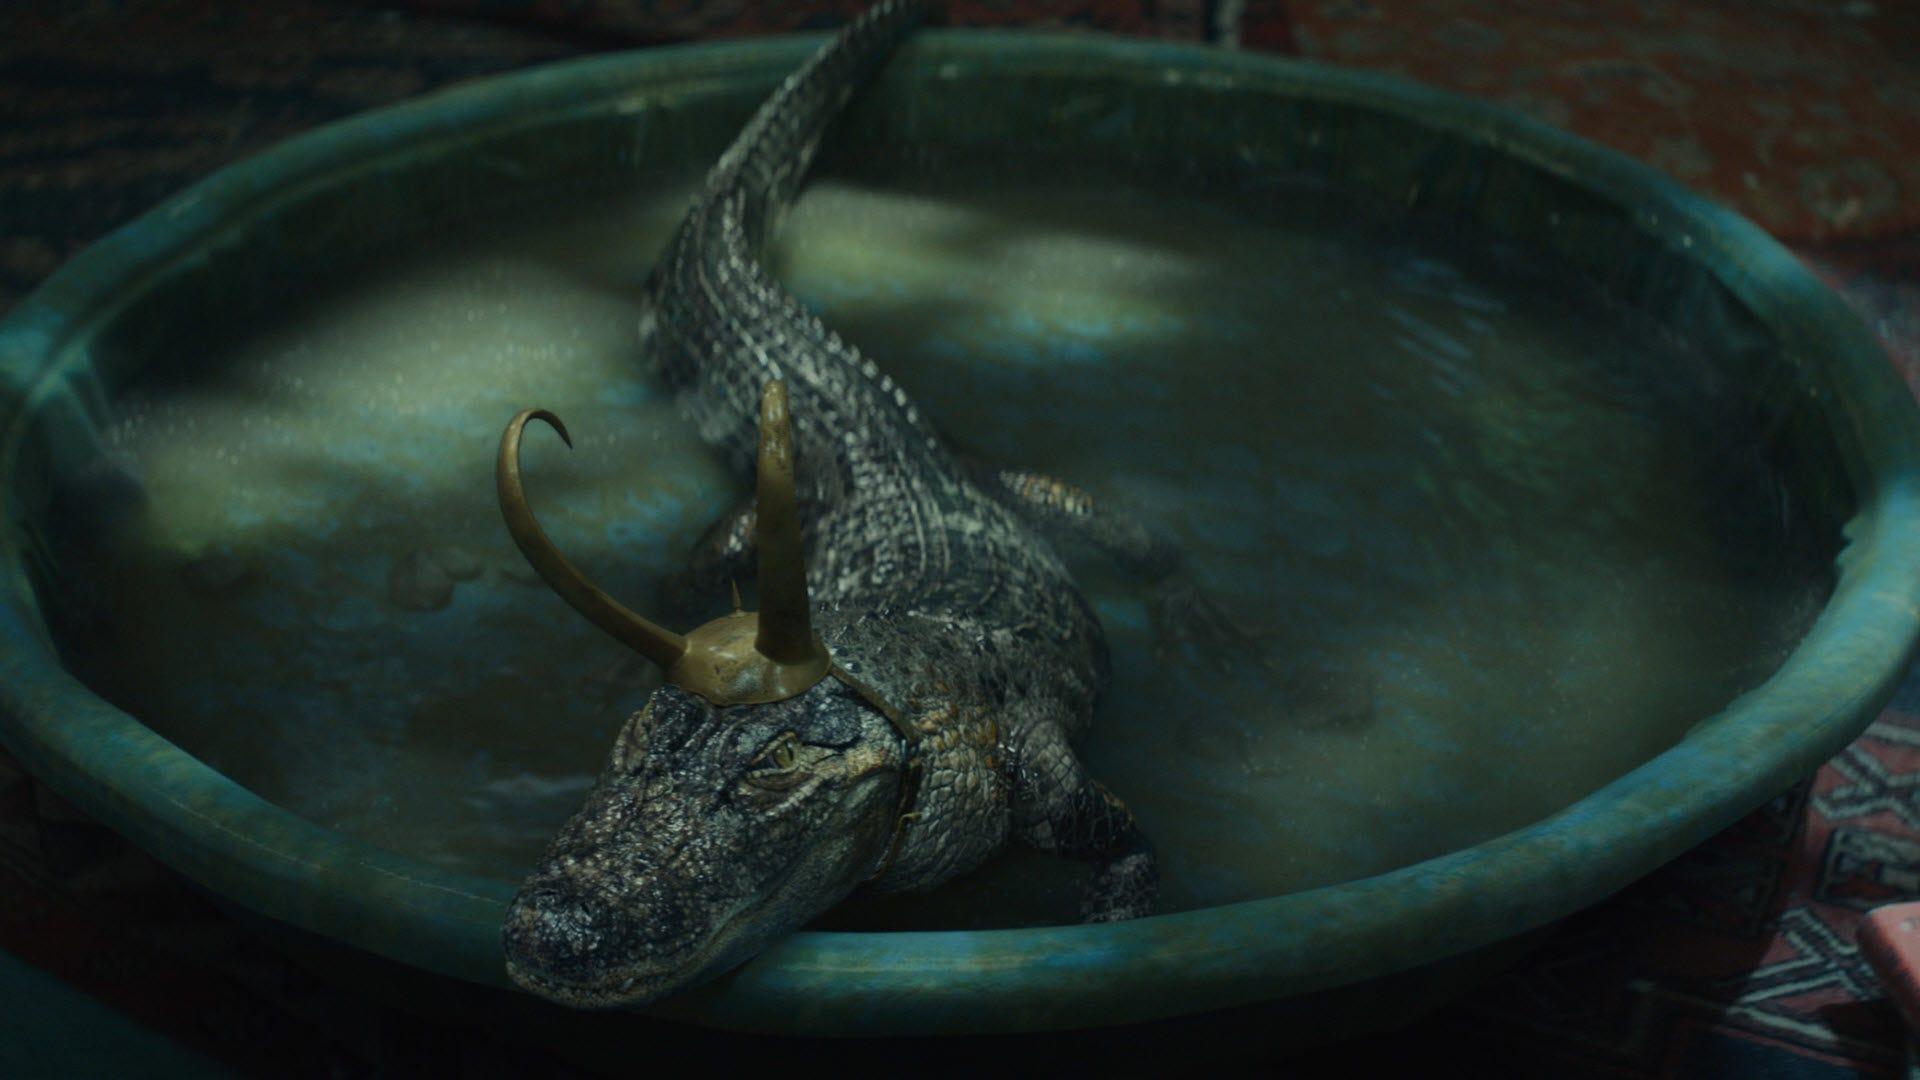 An Alligator Loki